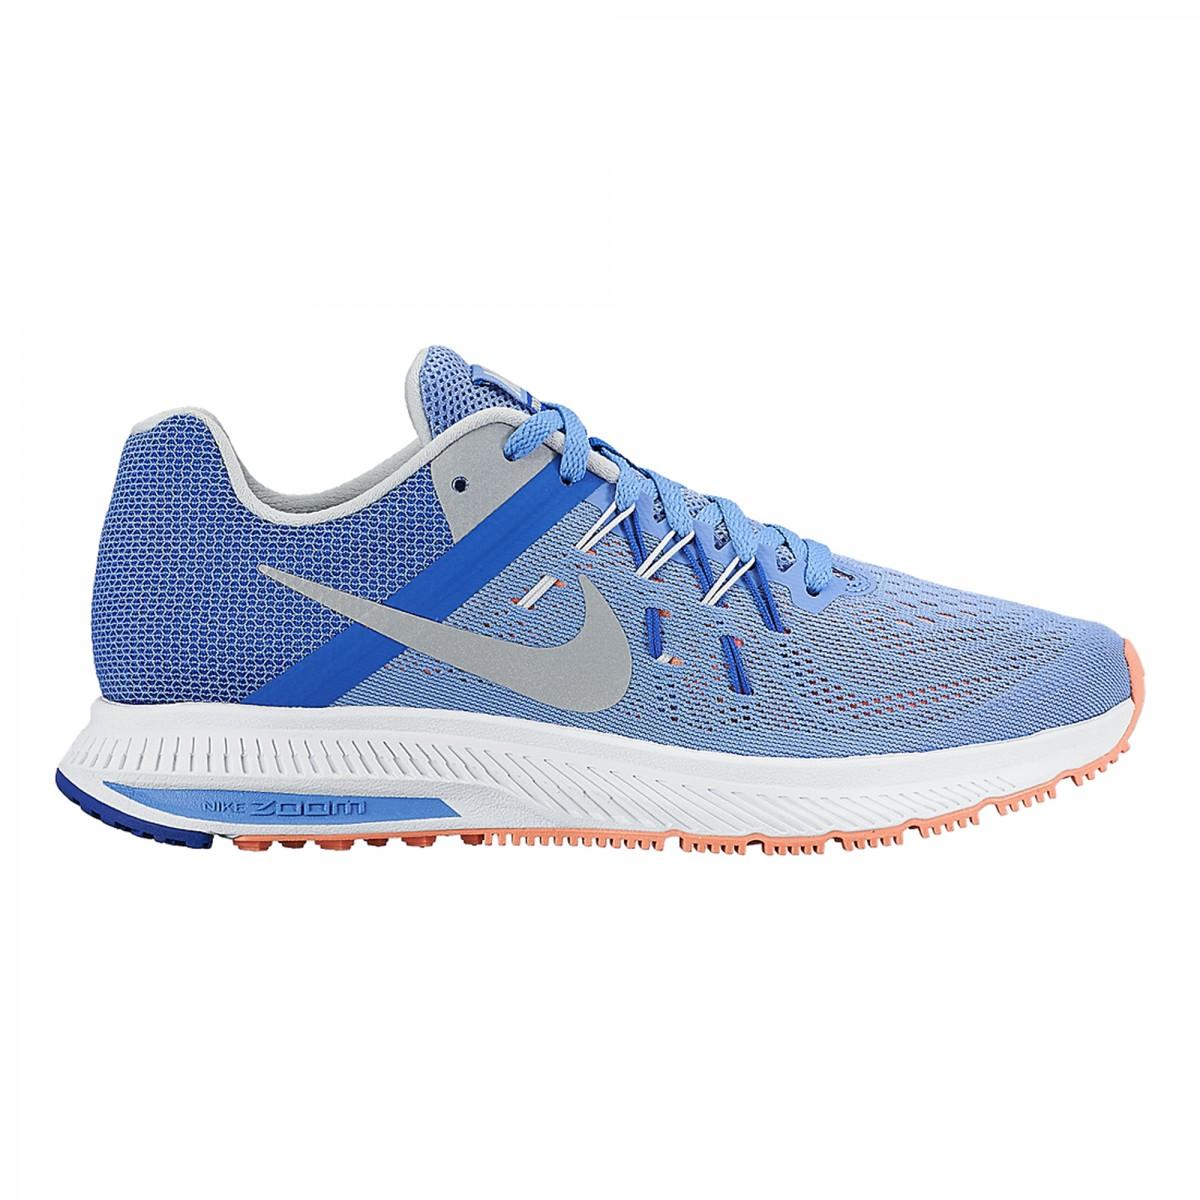 0b865e9c32 Bizz Store - Tênis Nike Zoom Winflo 2 Feminino